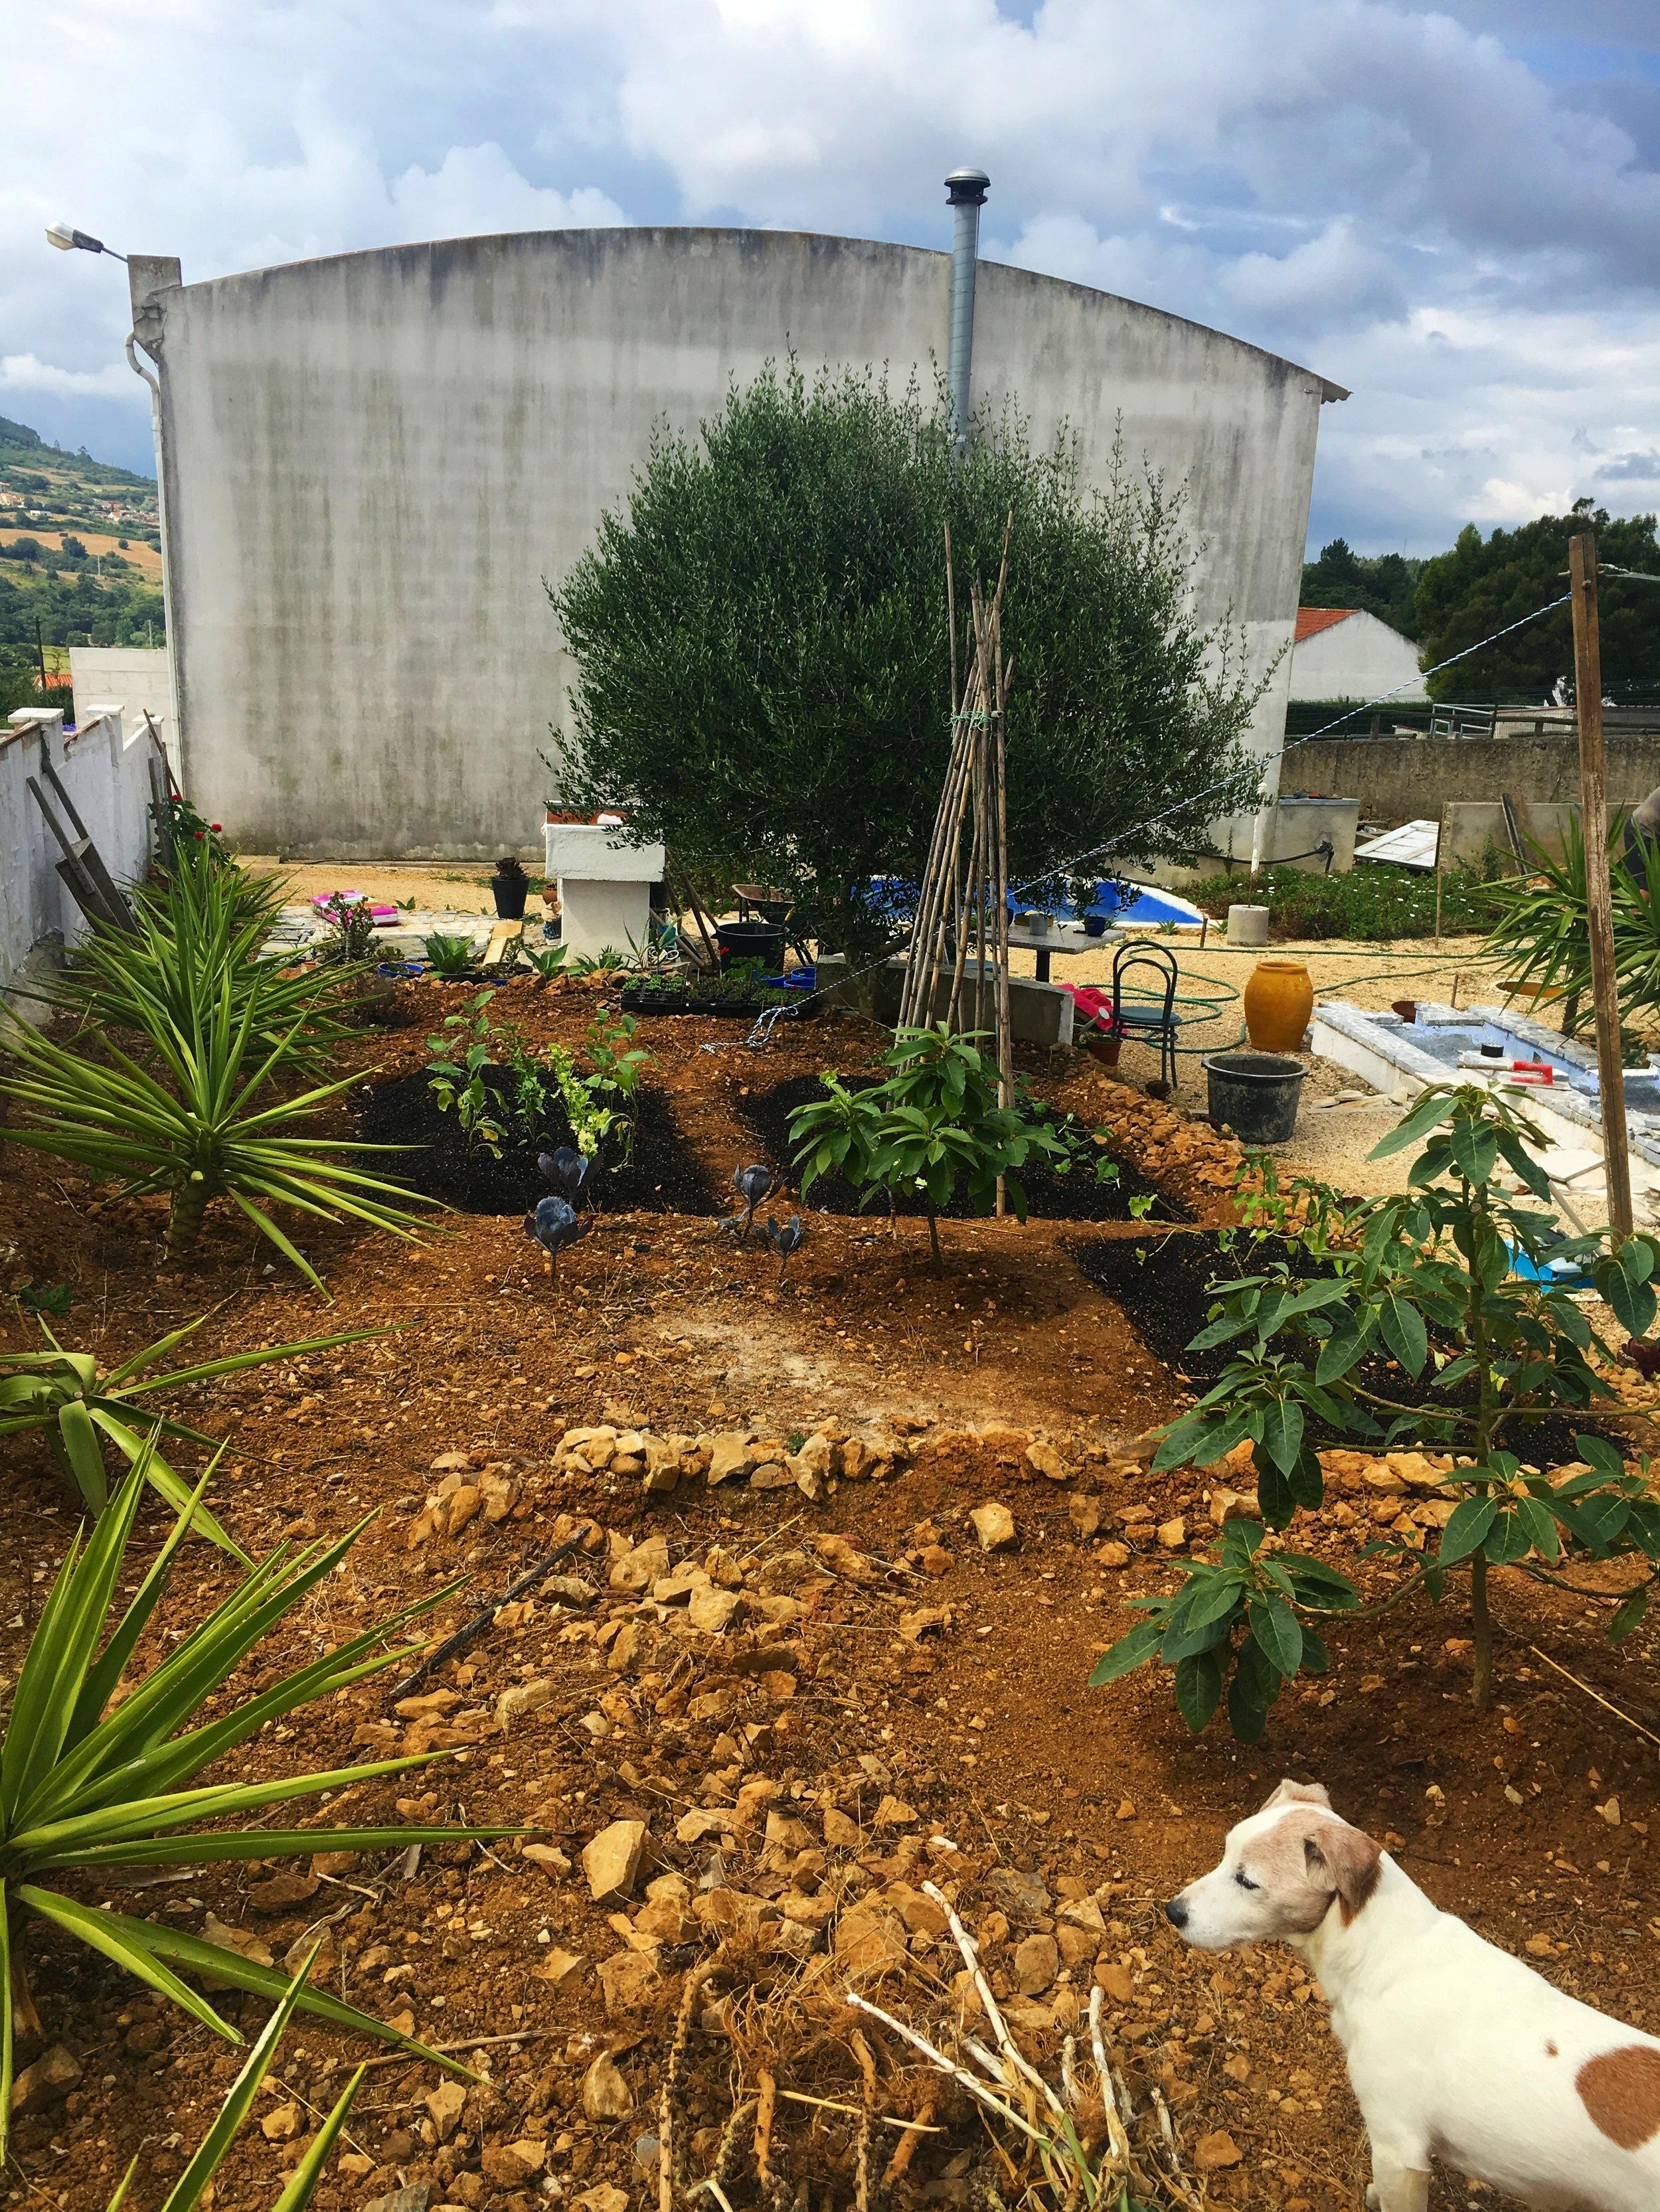 Art-cafe-garden-progress.jpg